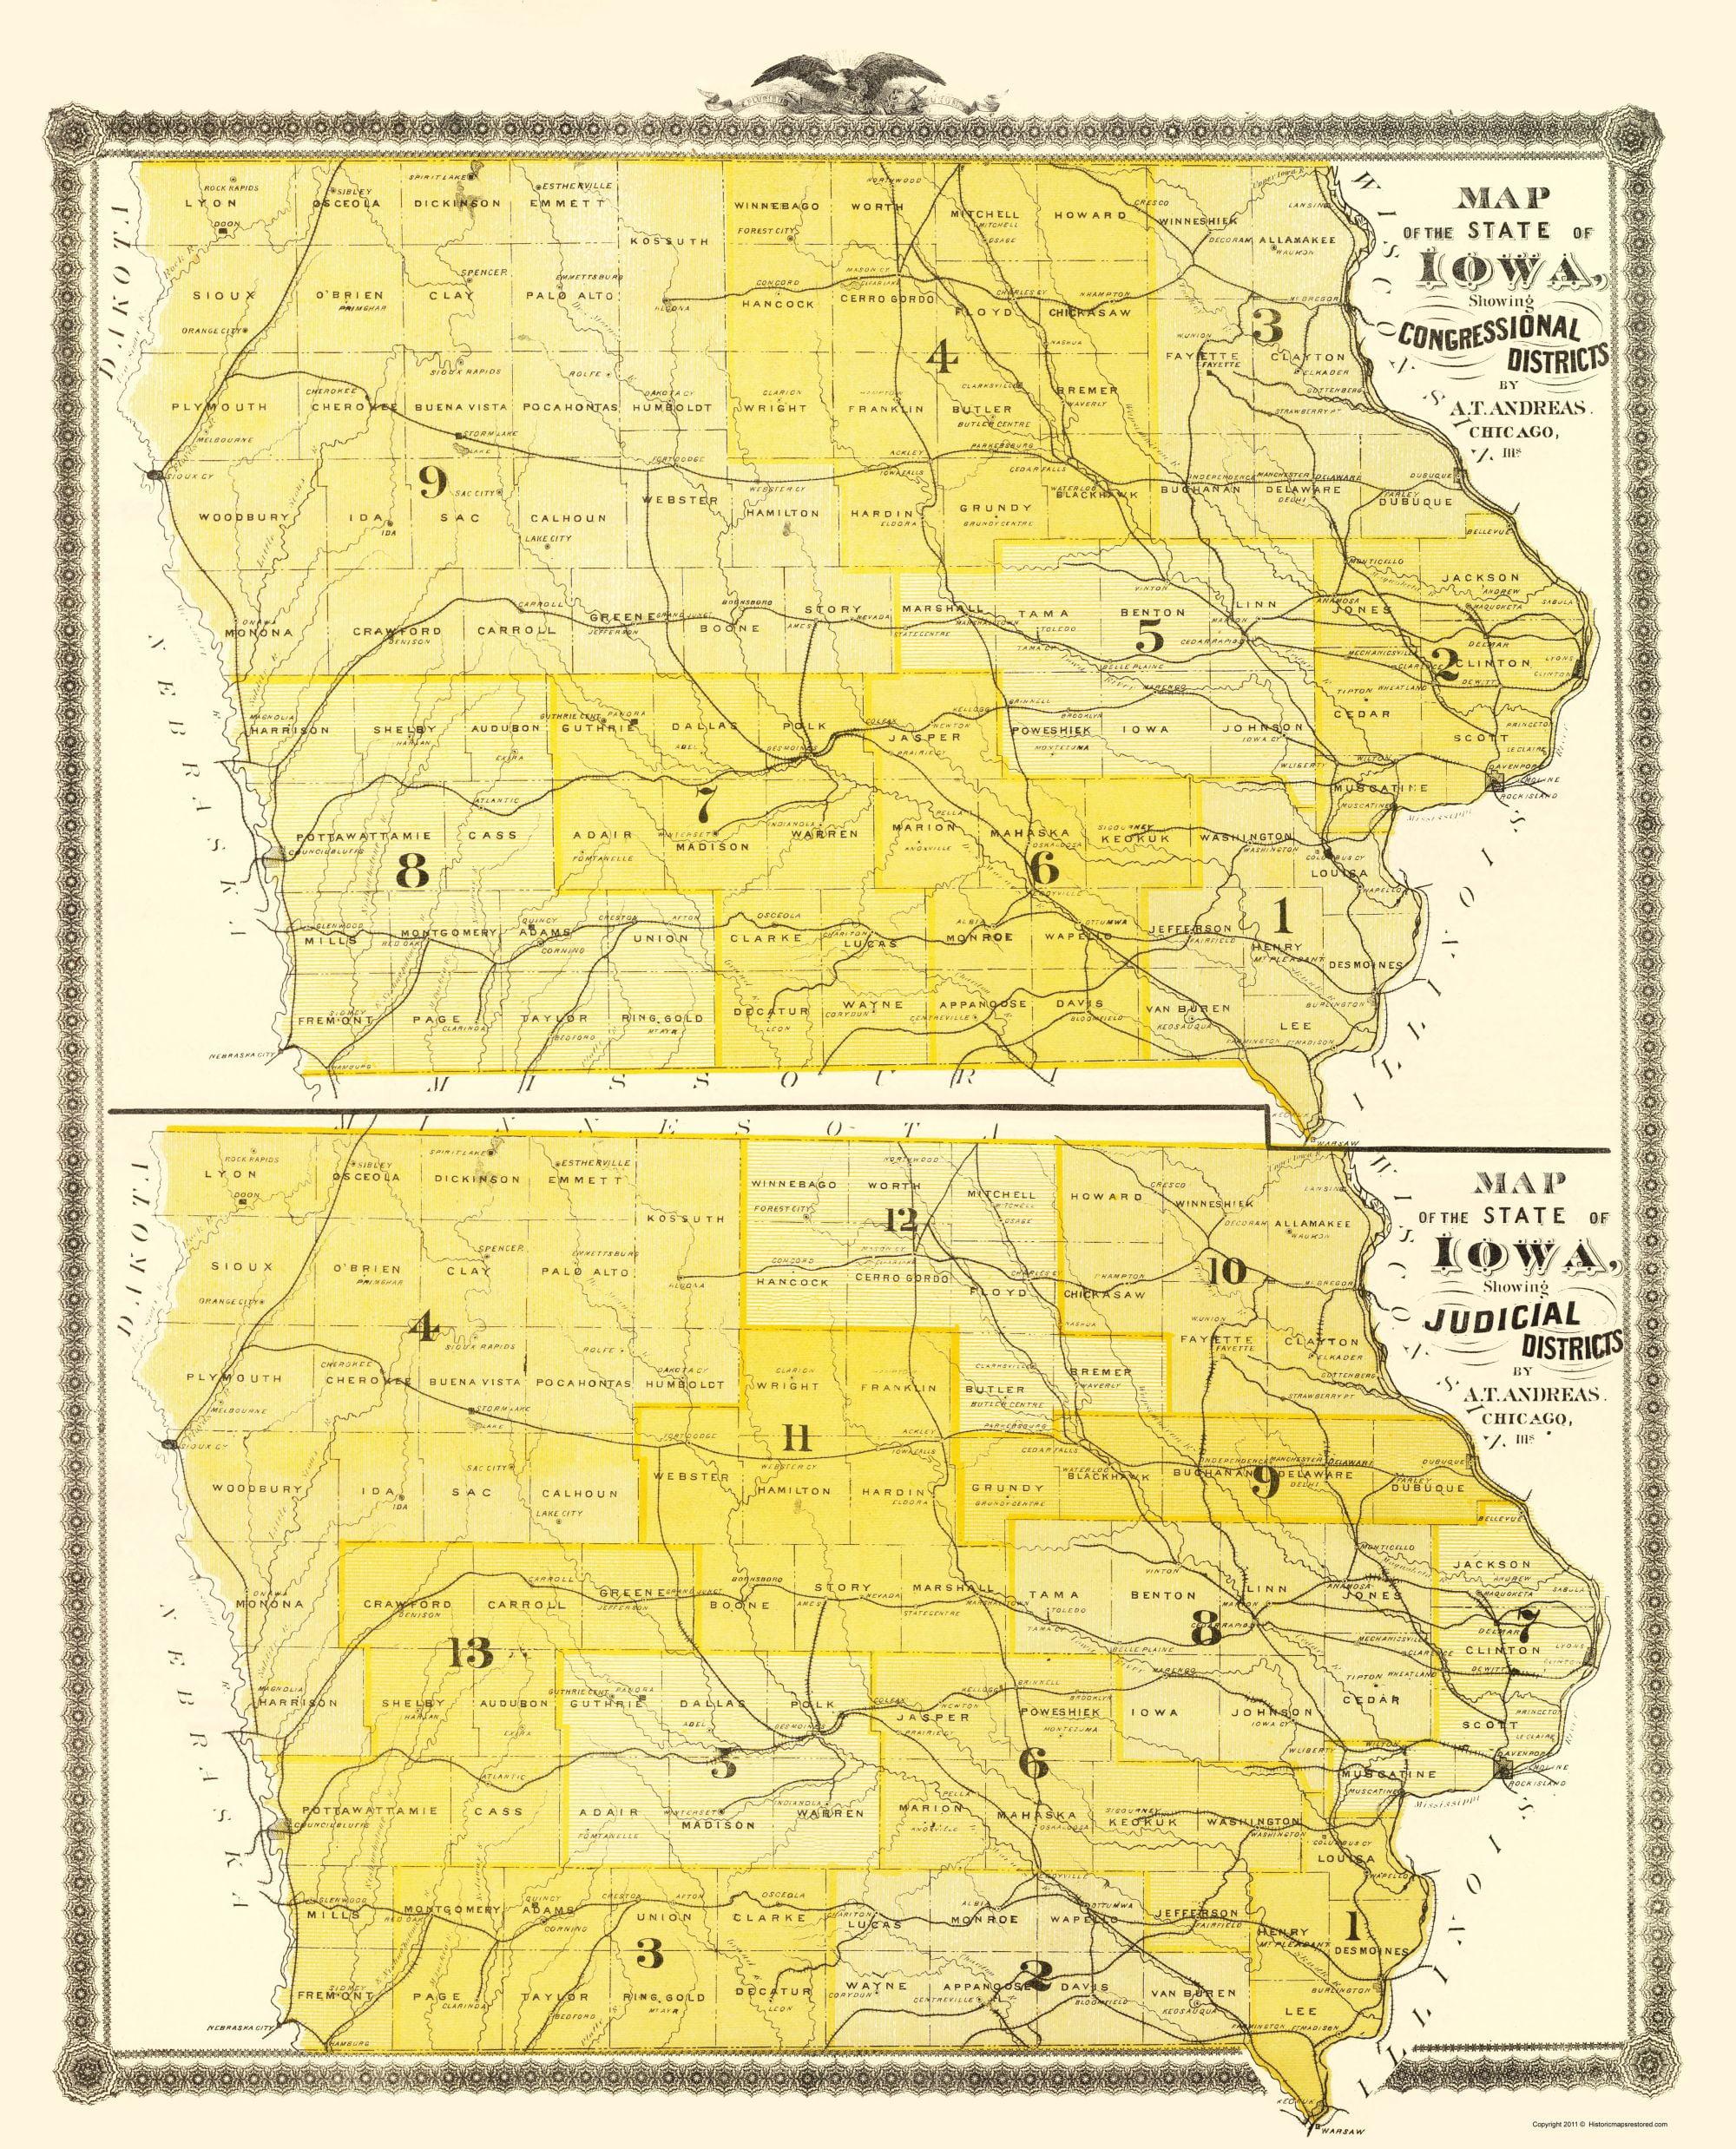 Iowa With Congressional, Judicial